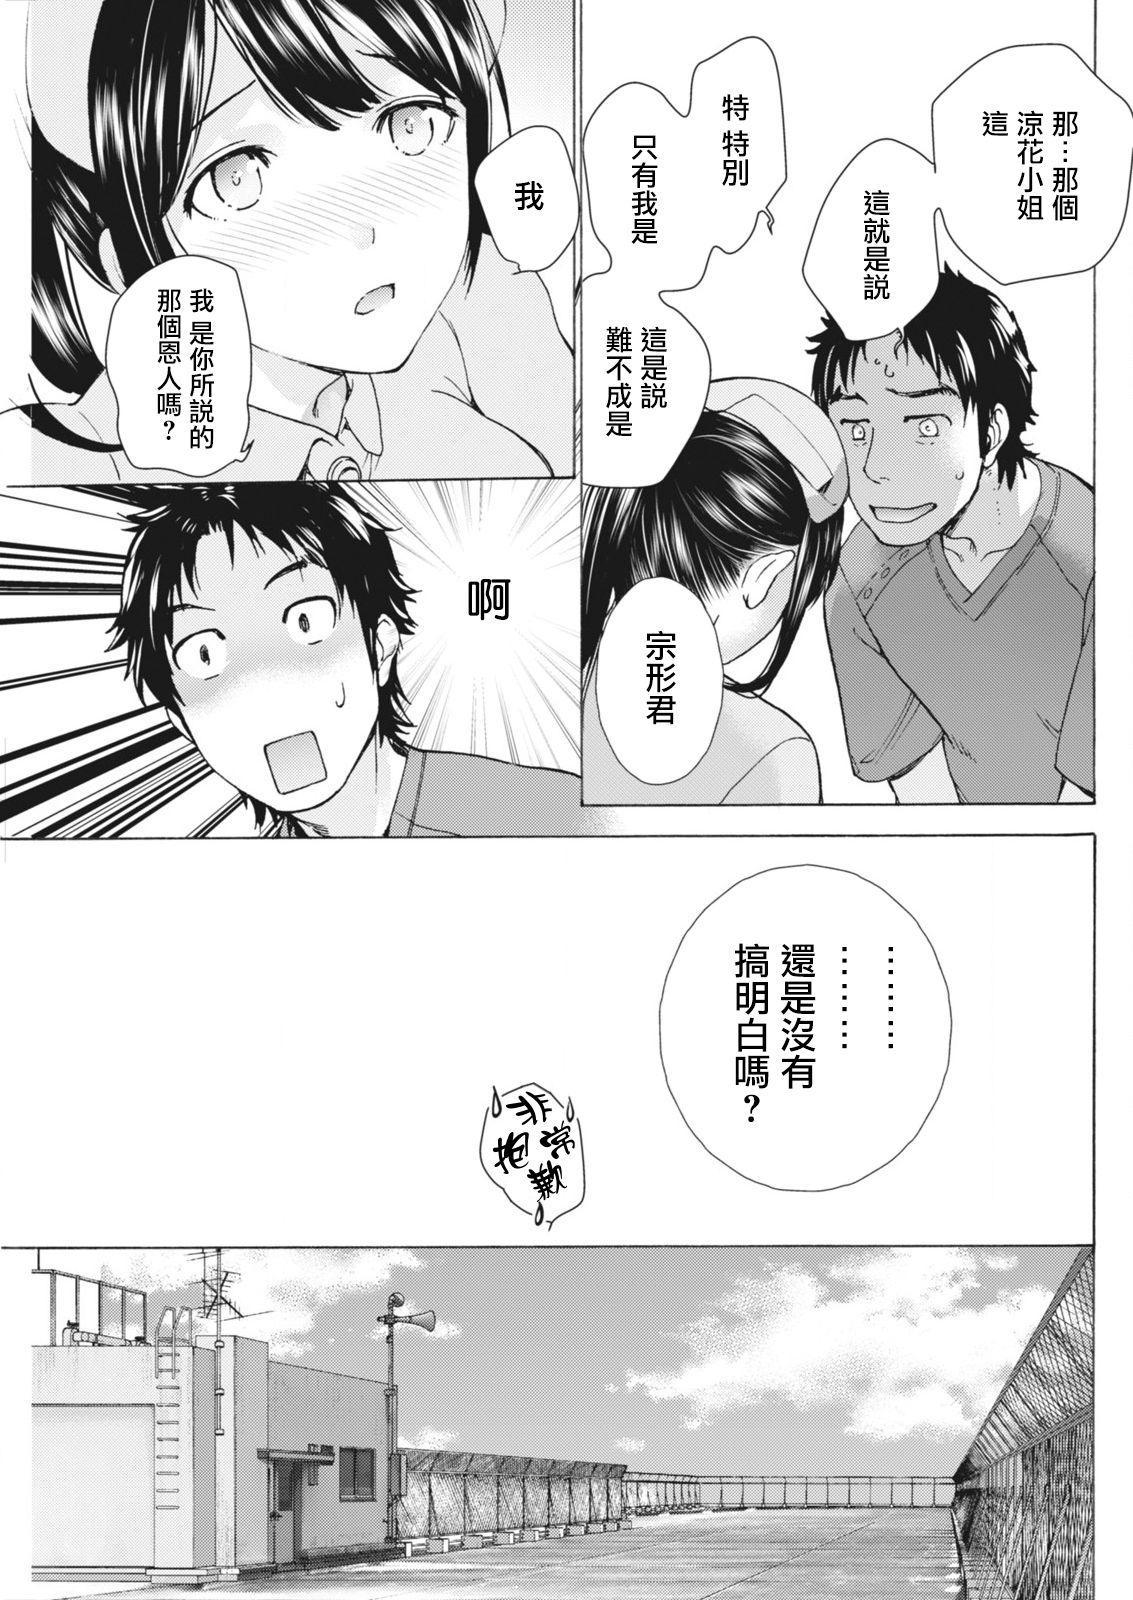 Opparadise wa Shinryouchu | 欧派天国诊疗中 Ch. 9 10